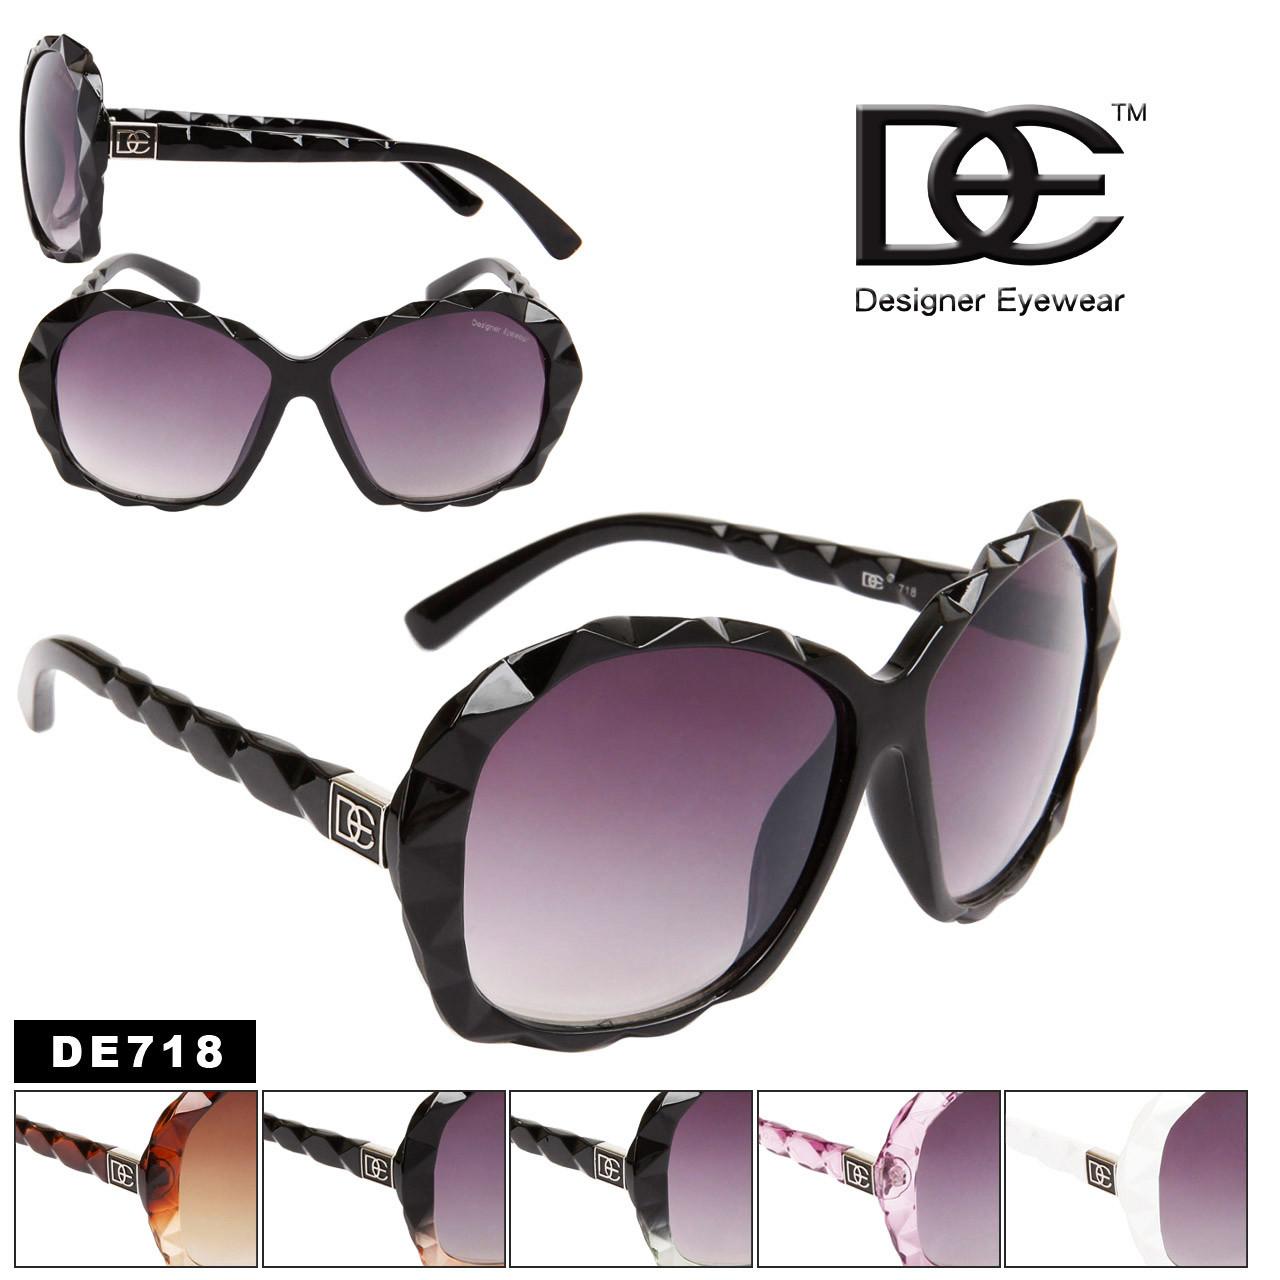 Women's Fashion Sunglasses DE718